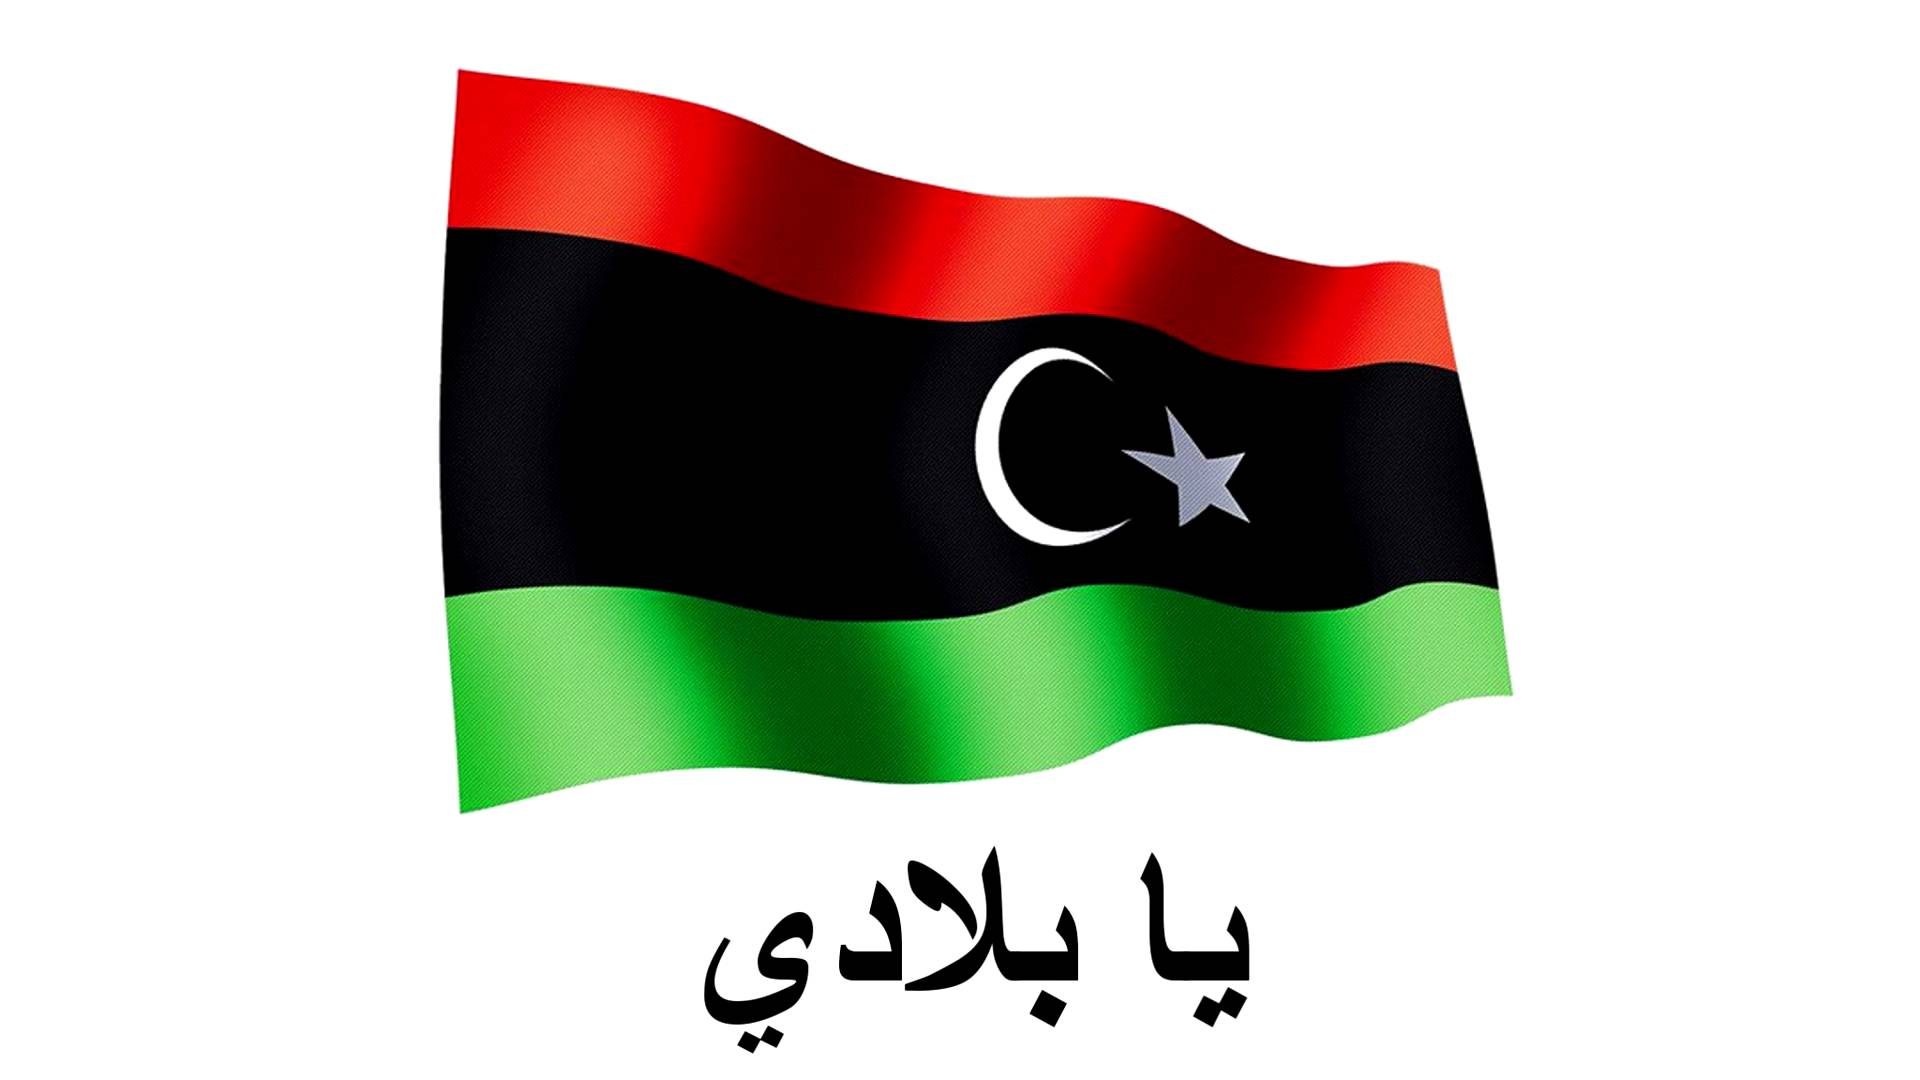 ��� ��� ����� , ������ ������� ����� , ��� ������ ���� ����� 2016 , Libya new_1422295592_995.j